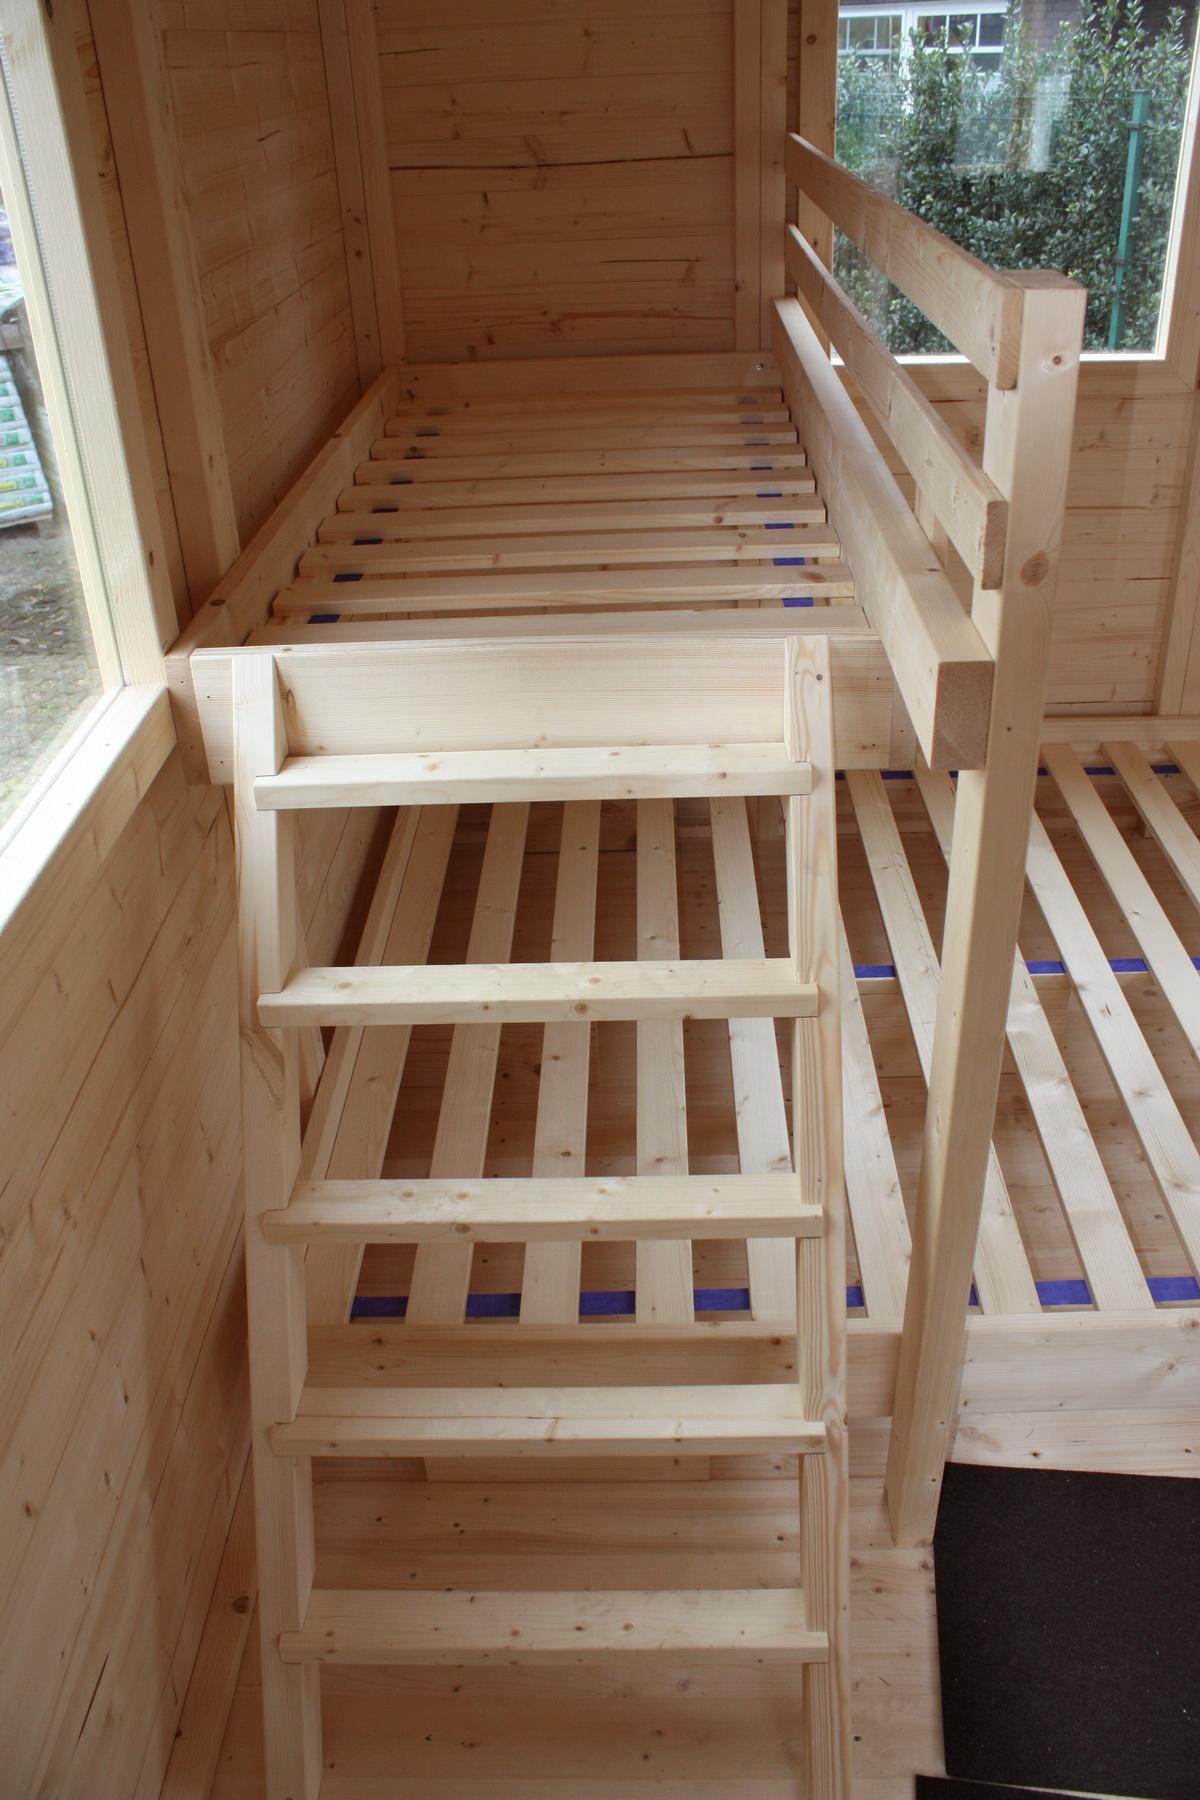 gartenhaus zirkuswagen 240 x 500 cm. Black Bedroom Furniture Sets. Home Design Ideas